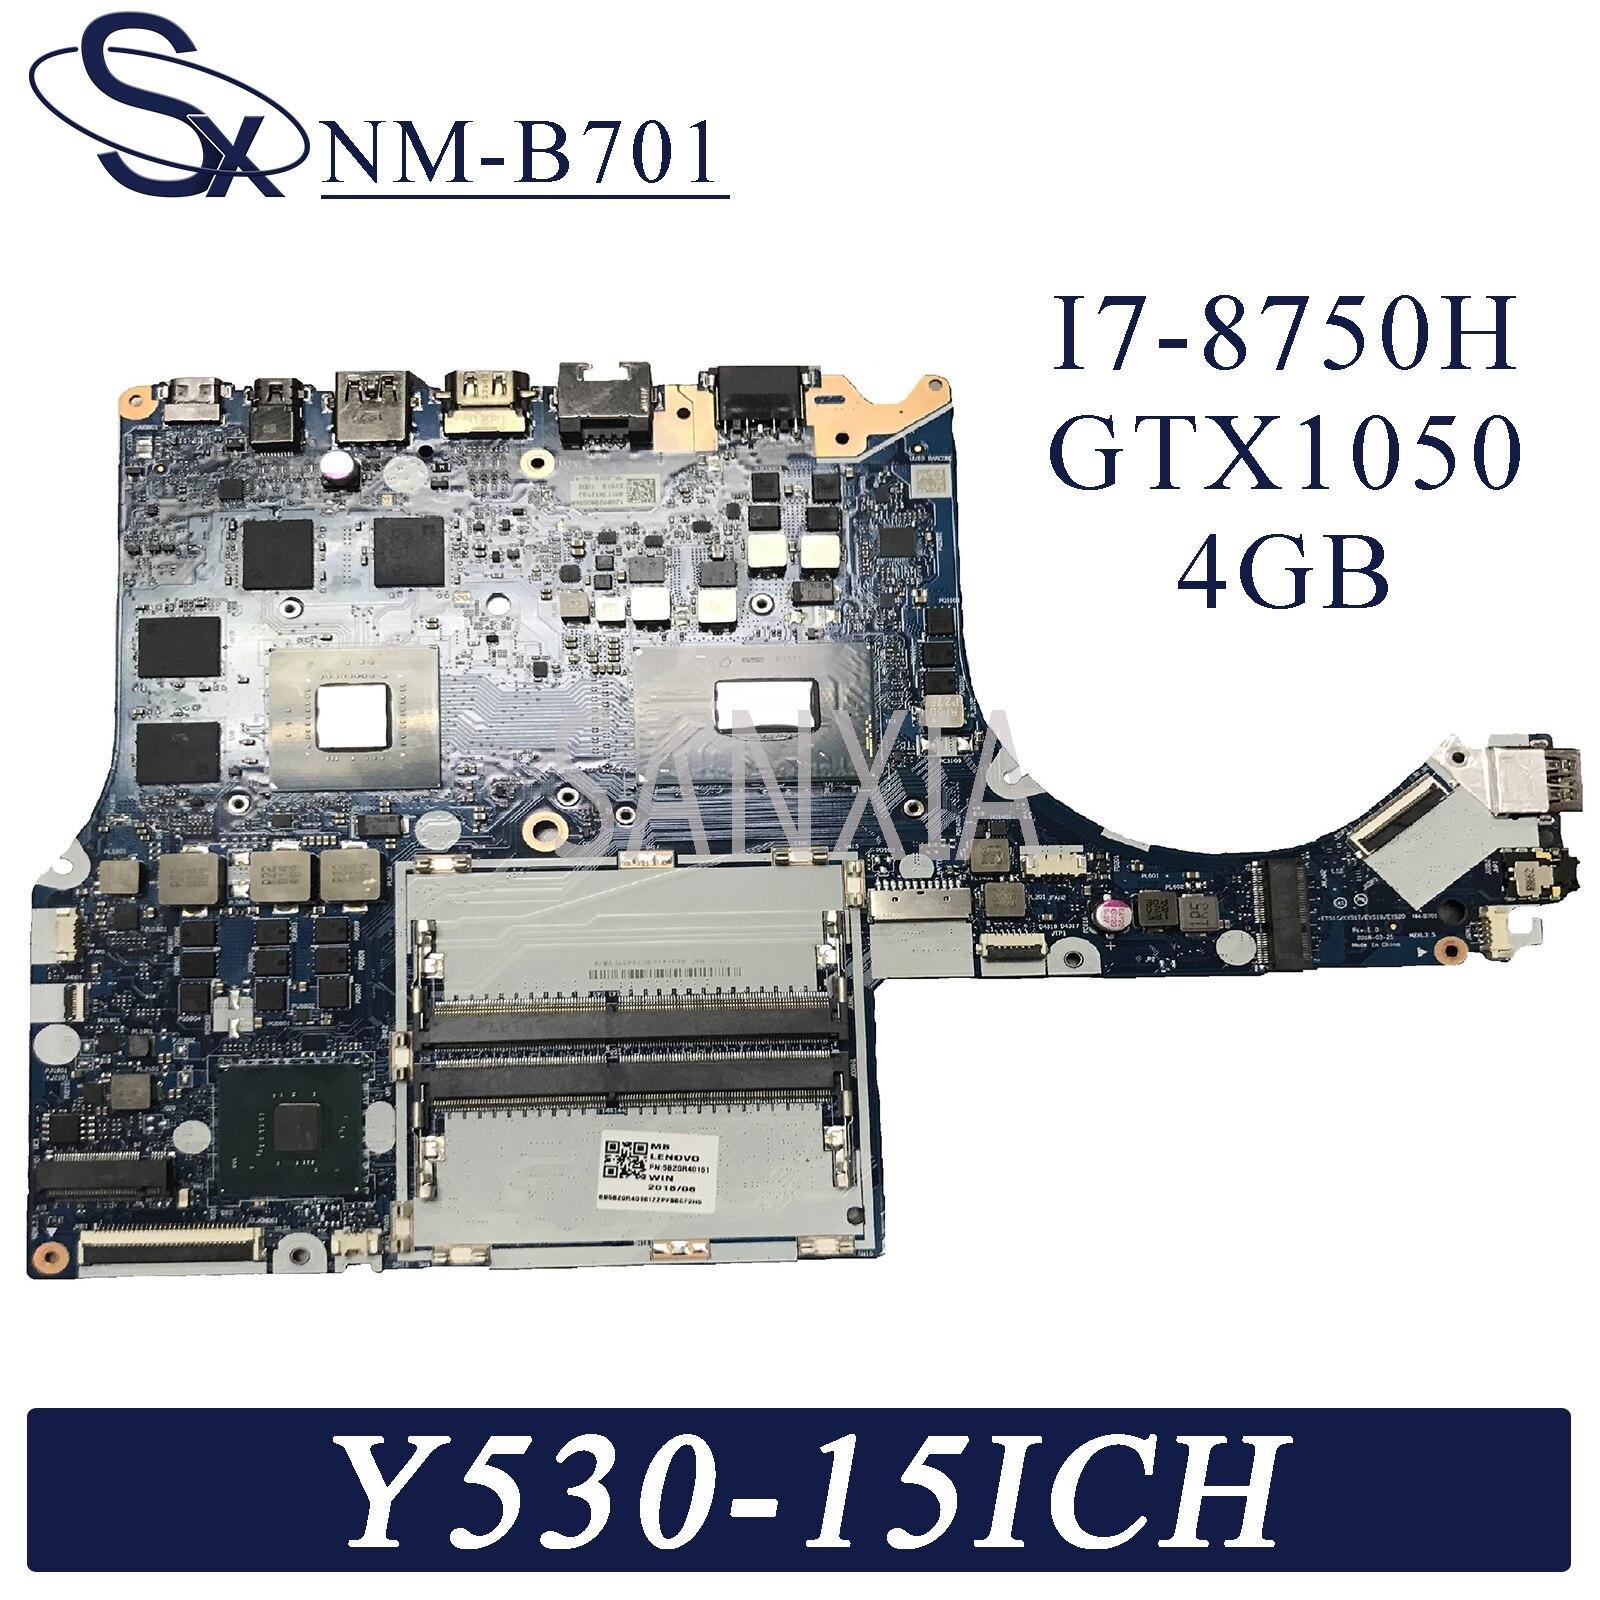 KEFU NM-B701 placa base de computadora portátil para Lenovo legión Y530-15ICH placa base original de I7-8750H GTX1050-4GB